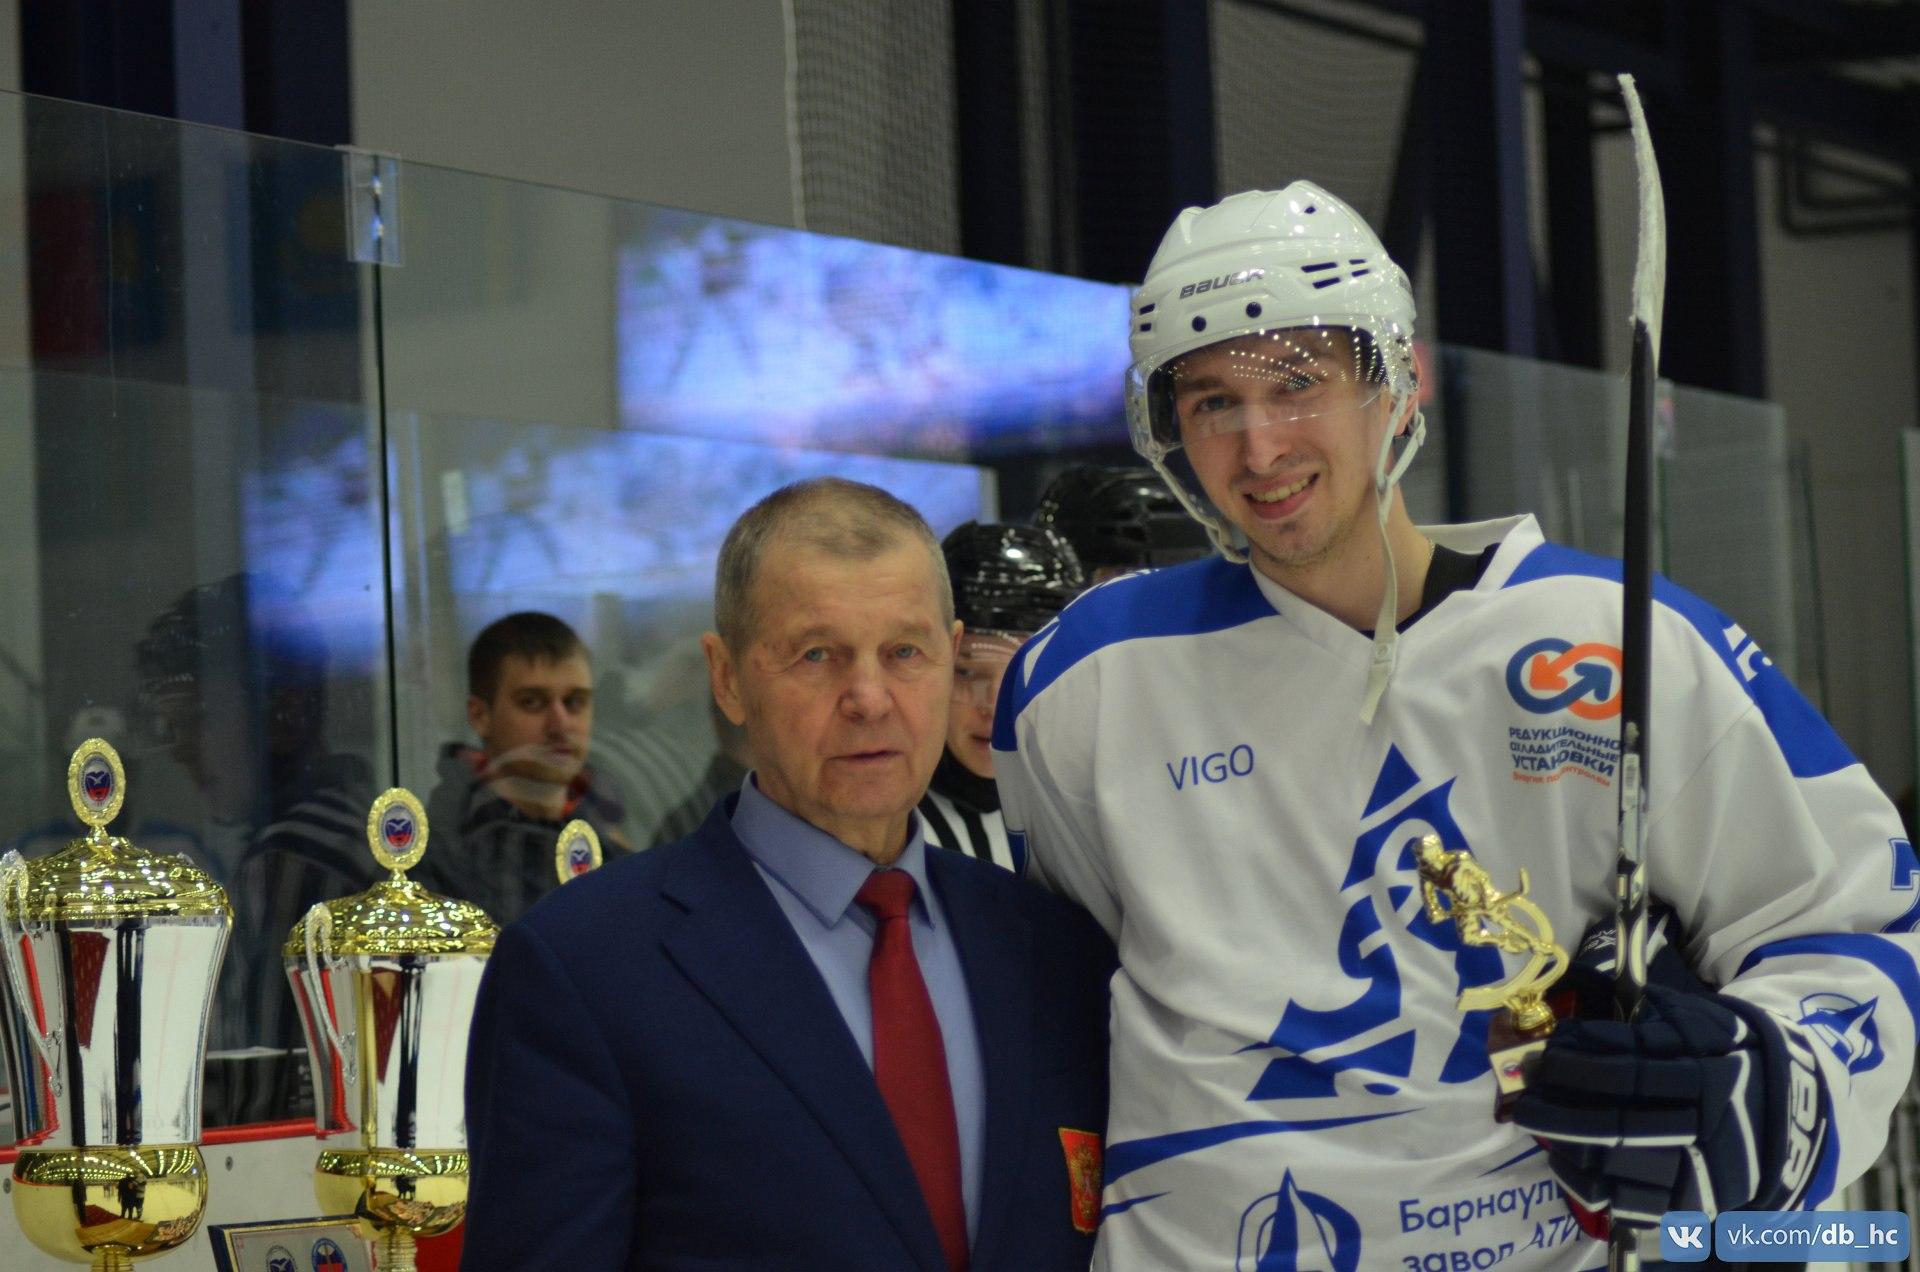 Лучший бомбардир: Максим Чирков (Динамо г. Барнаул)